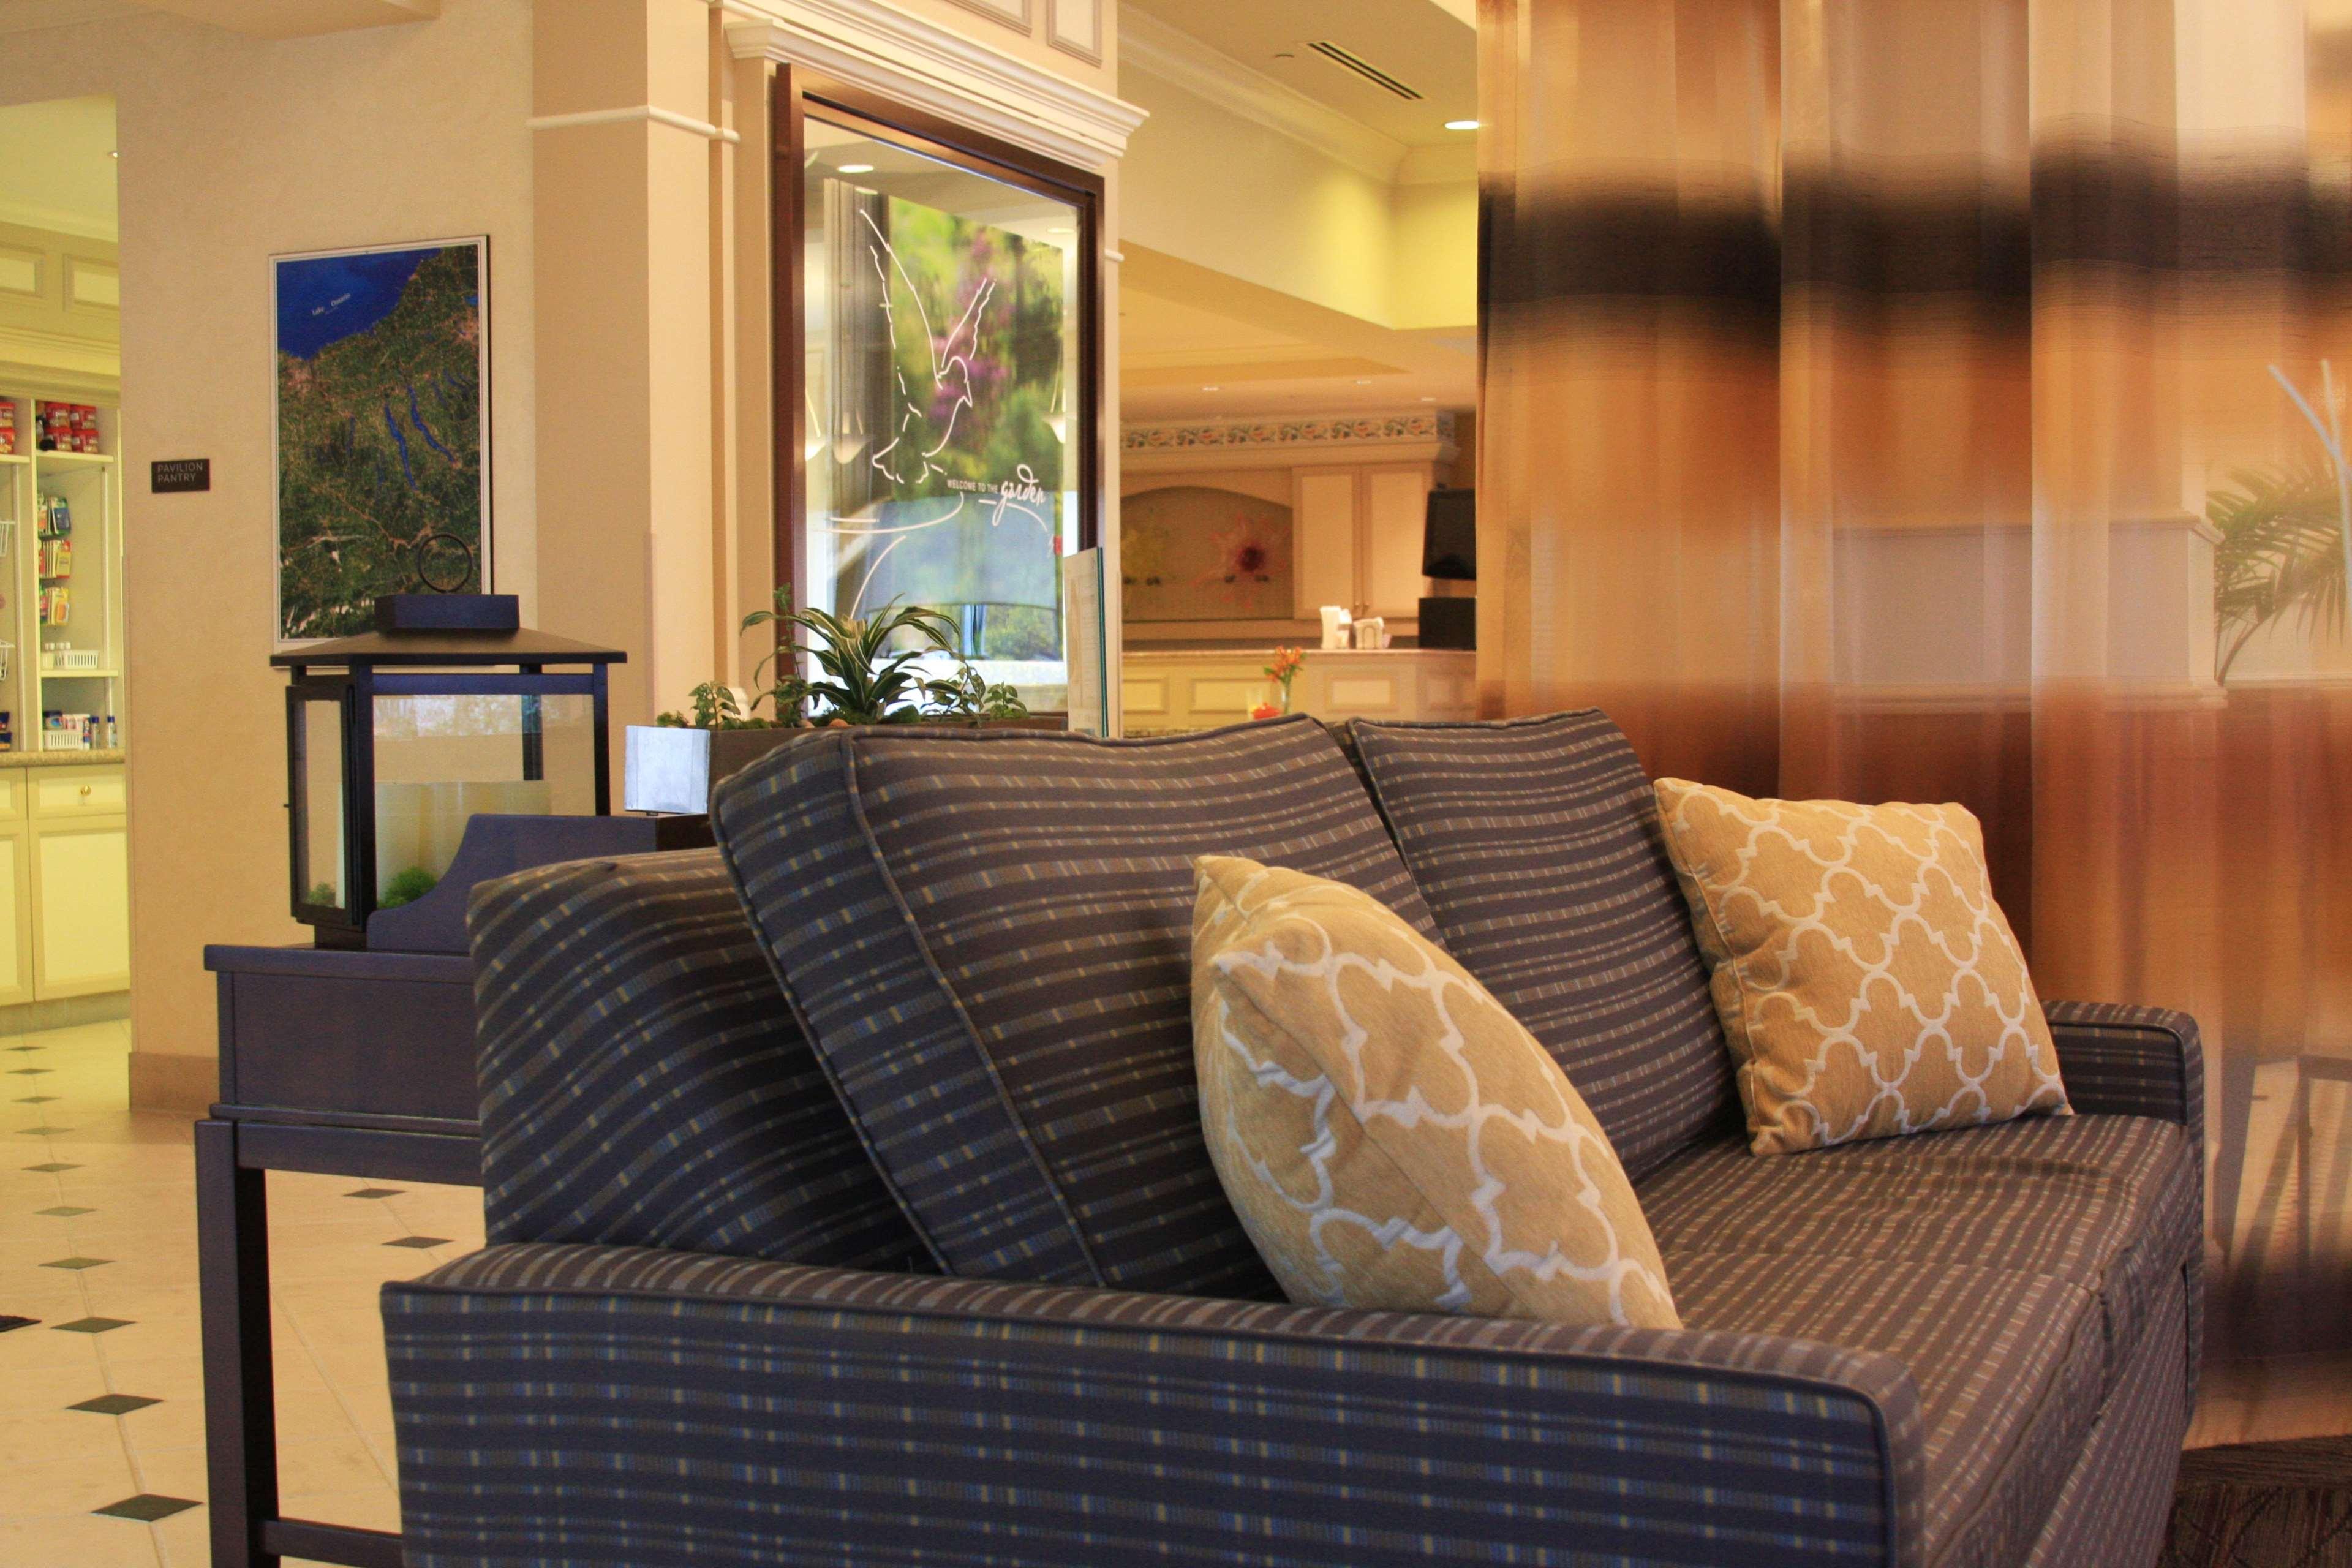 Hilton Garden Inn Elmira/Corning image 10